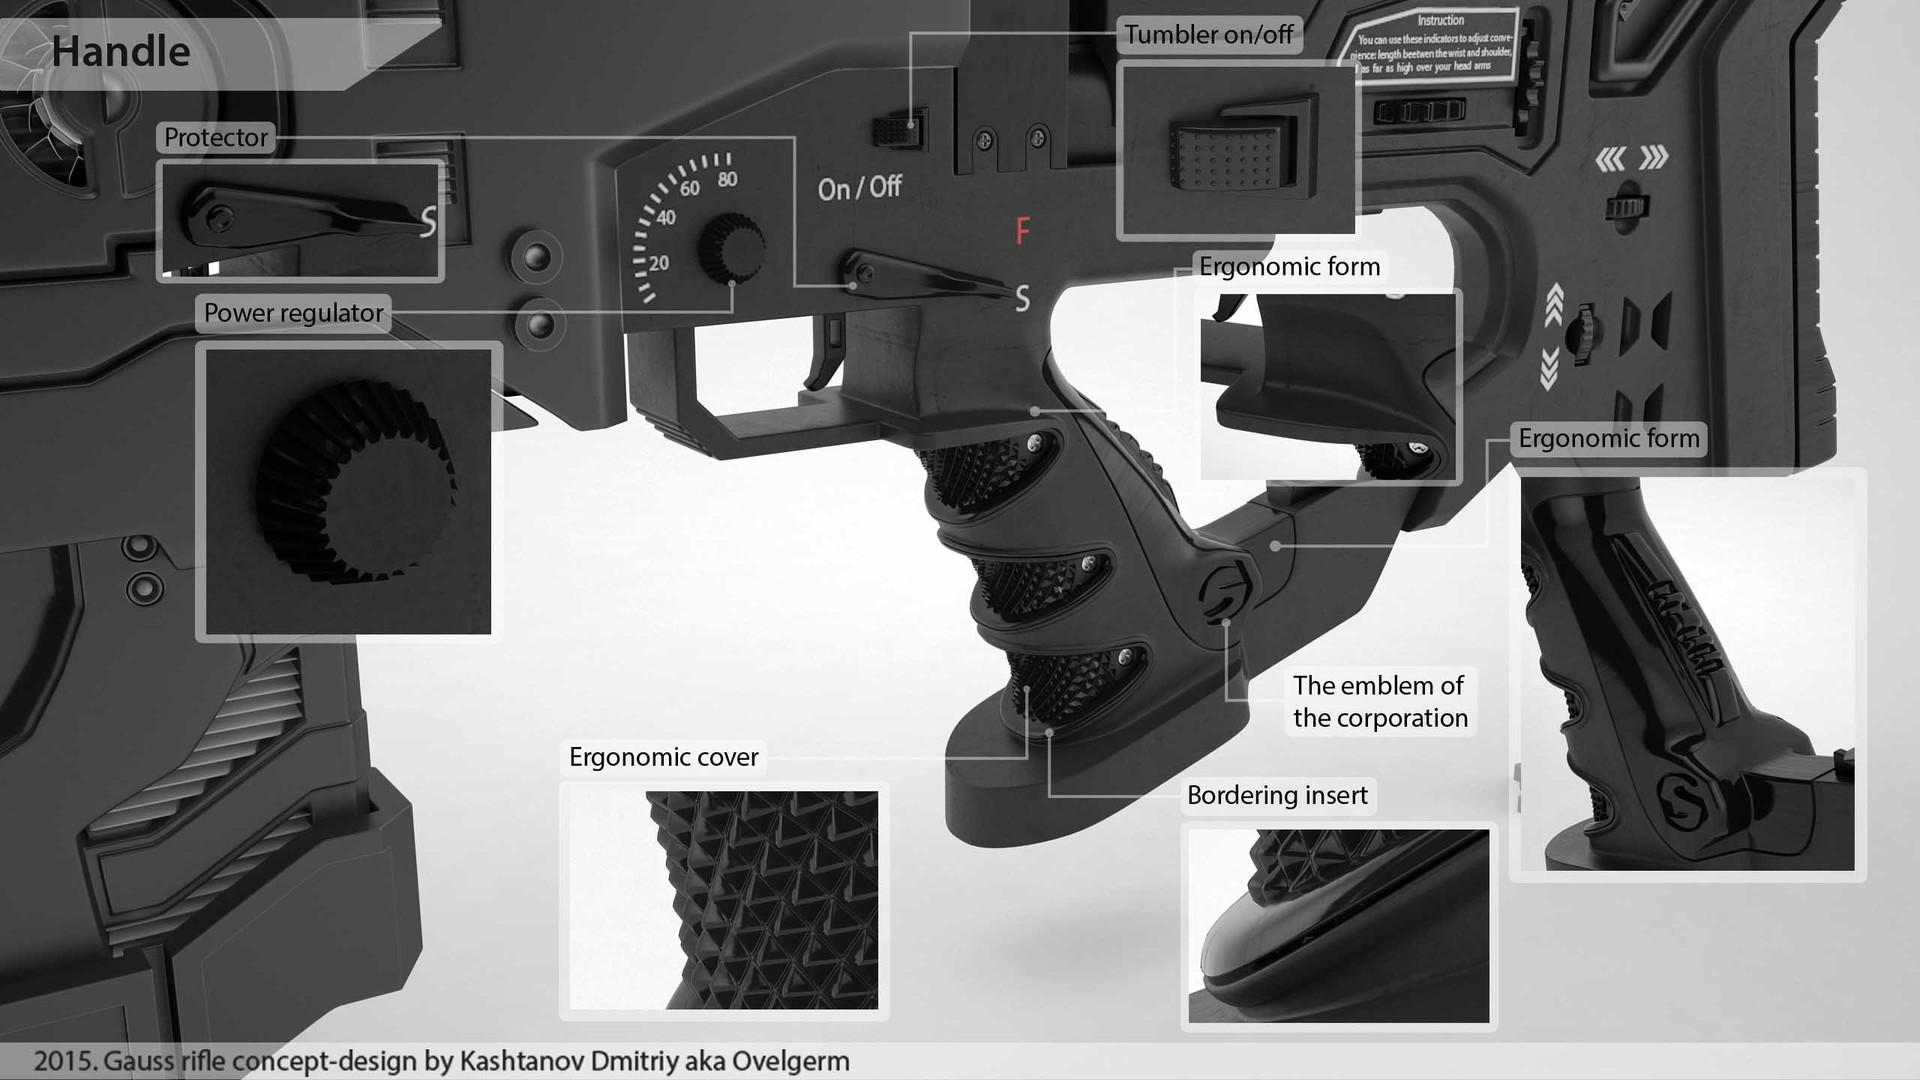 Dmitriy Kashtanov - Gauss rifle concept-design